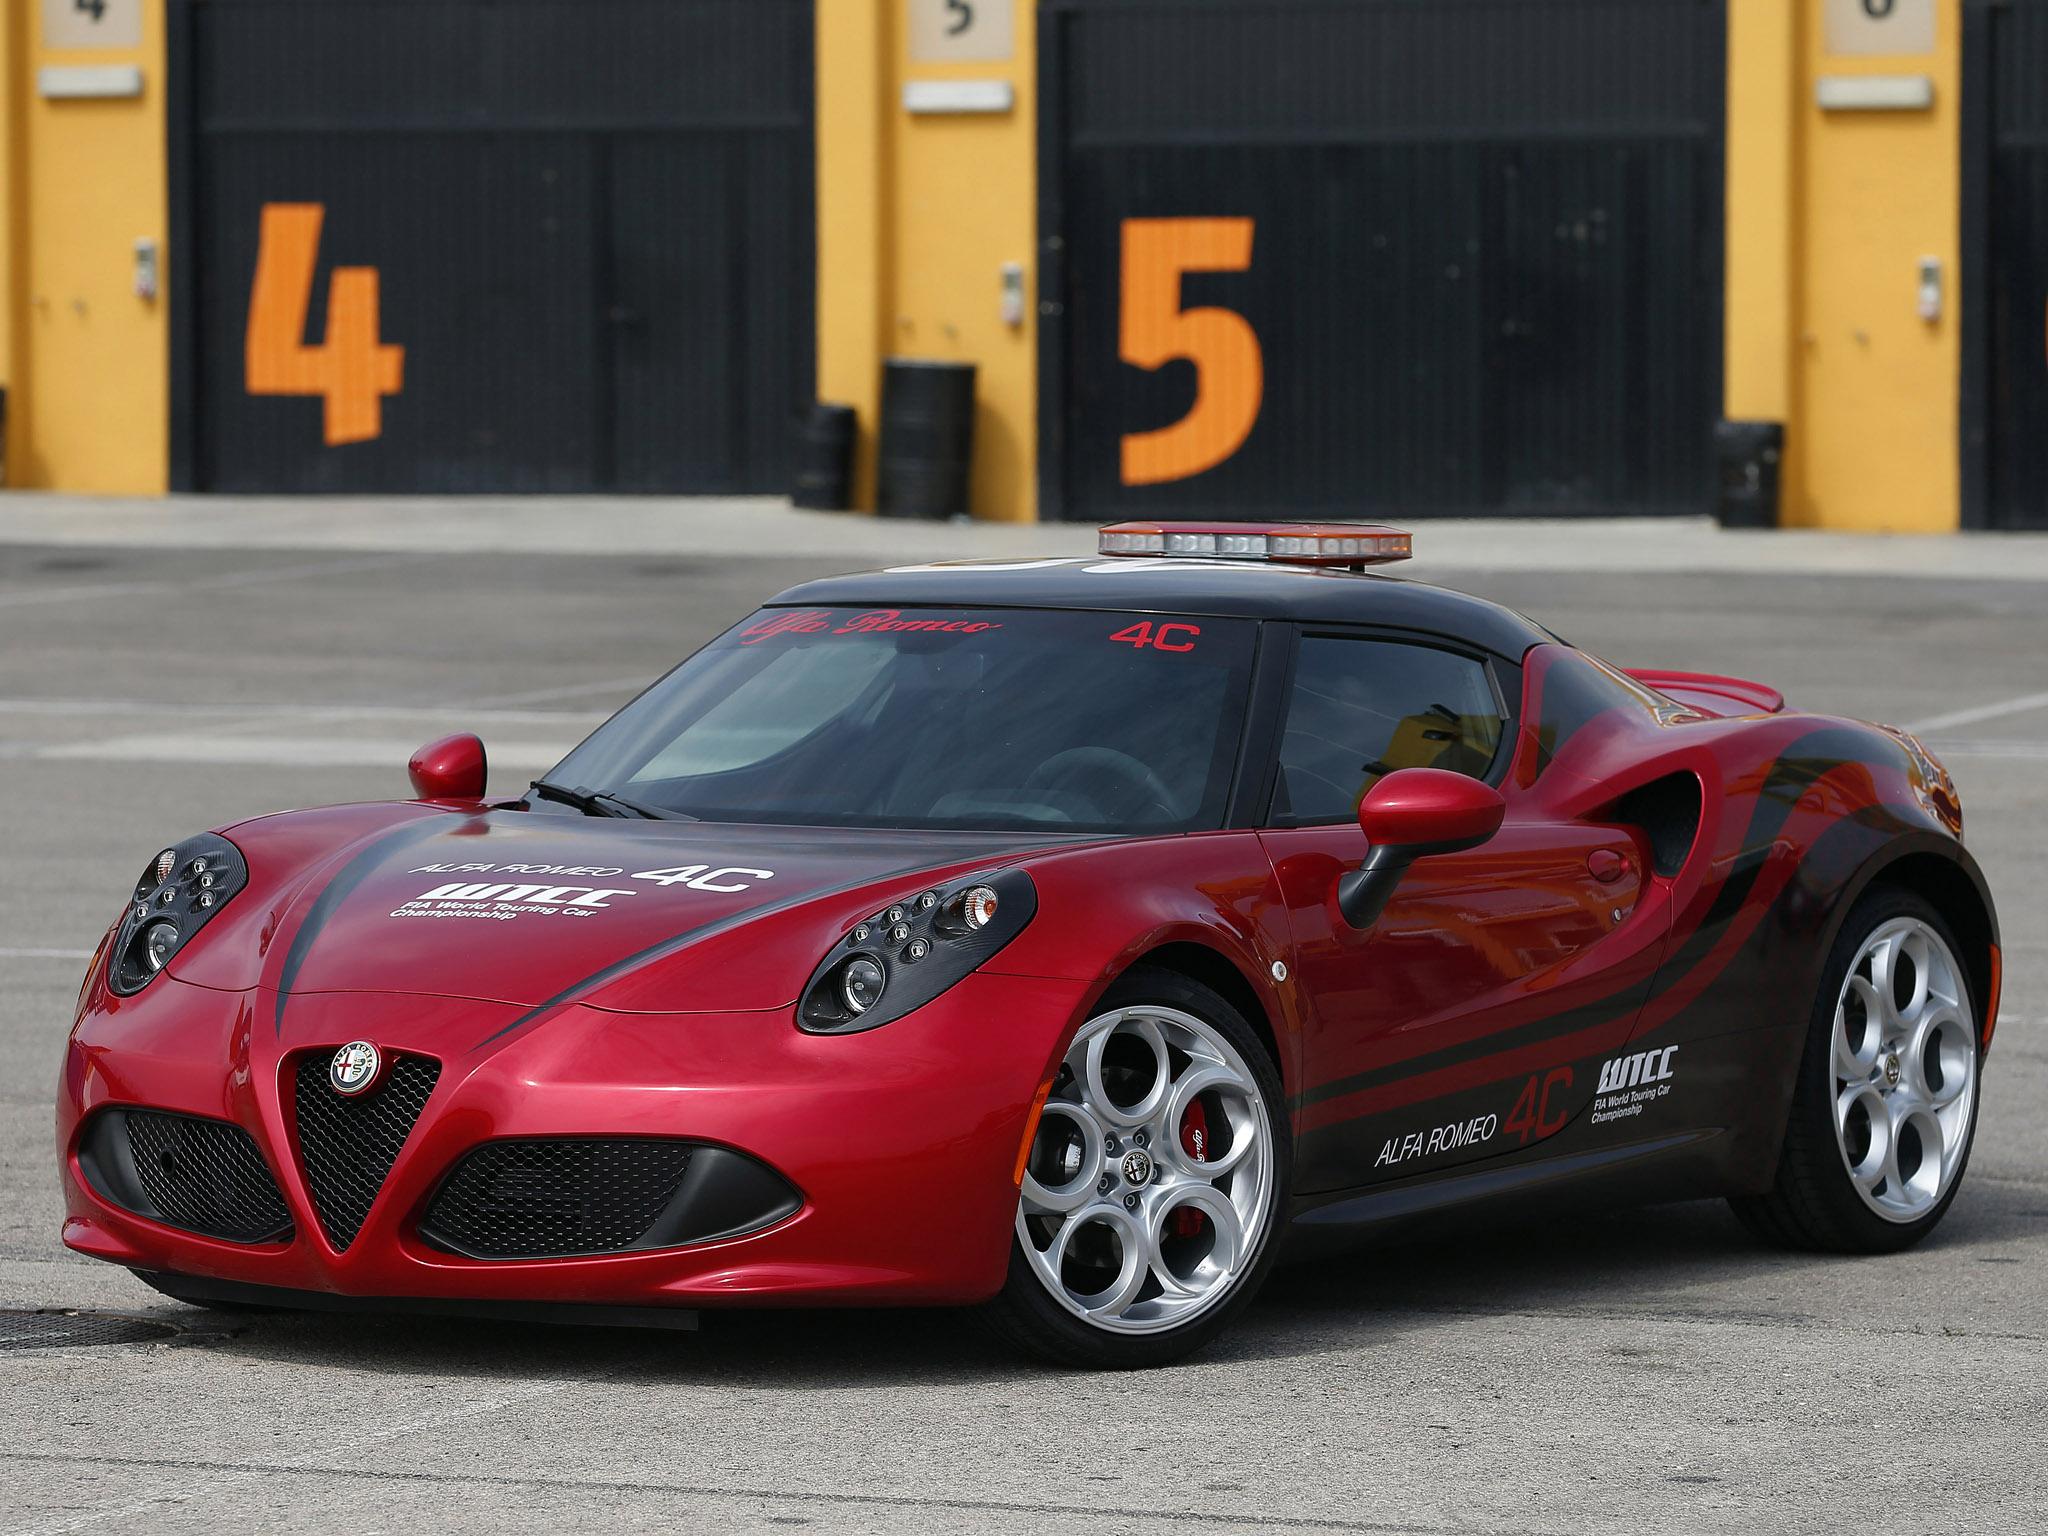 2014-Alfa-Romeo-4C-WTCC-Safety-Car-Wallpapers-pics